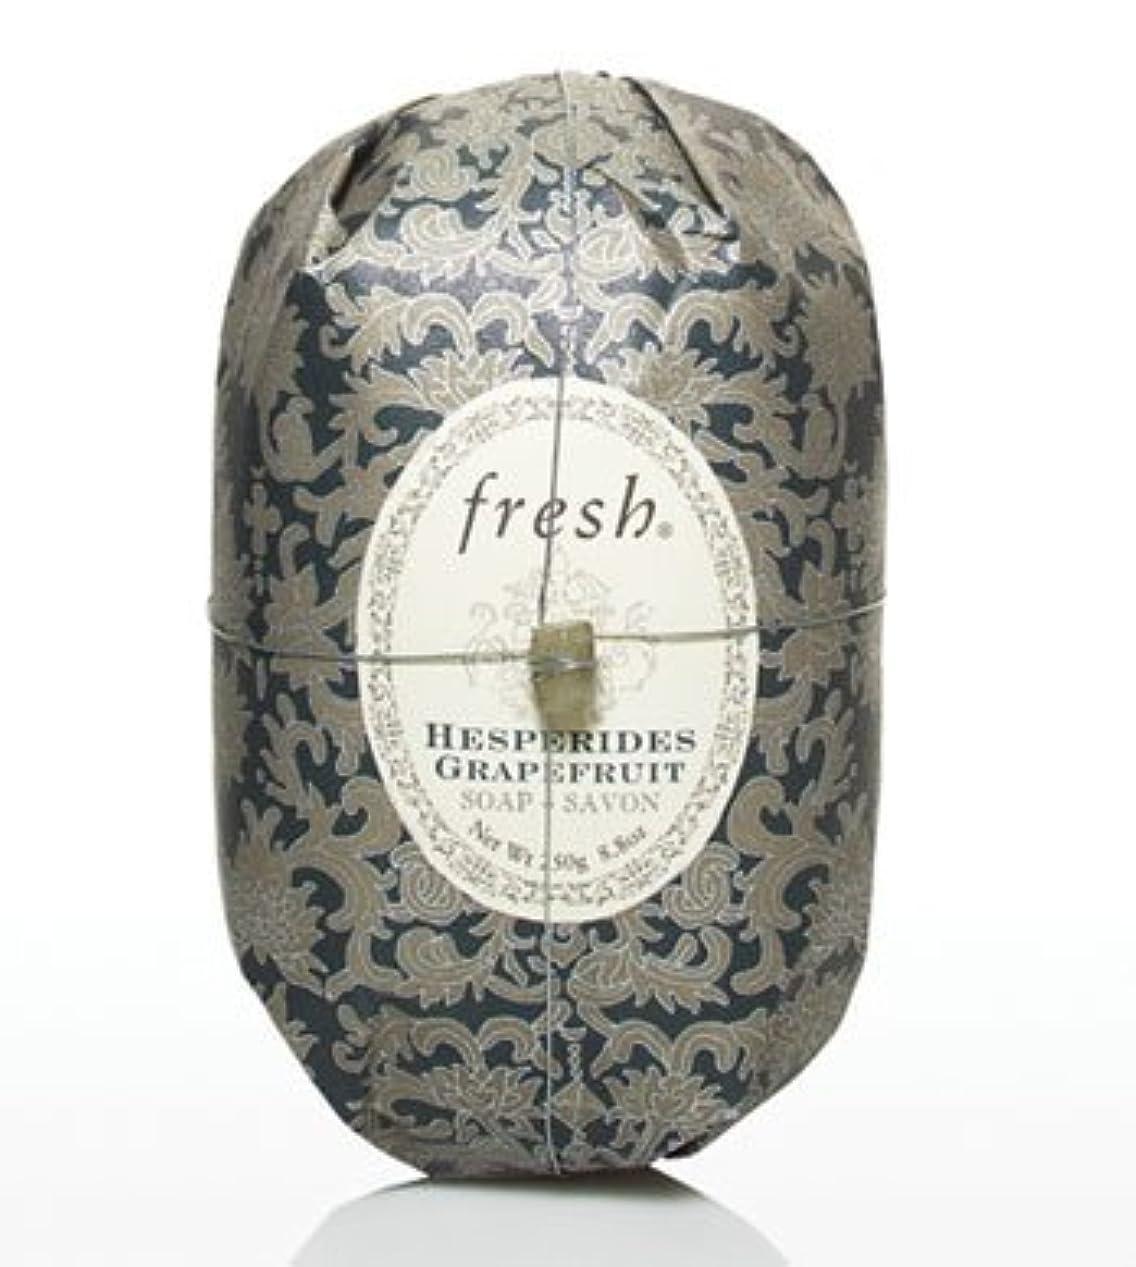 Fresh HESPERIDES GRAPEFRUIT SOAP (フレッシュ ヘスペリデス グレープフルーツ ソープ) 8.8 oz (250g) Soap (石鹸) by Fresh